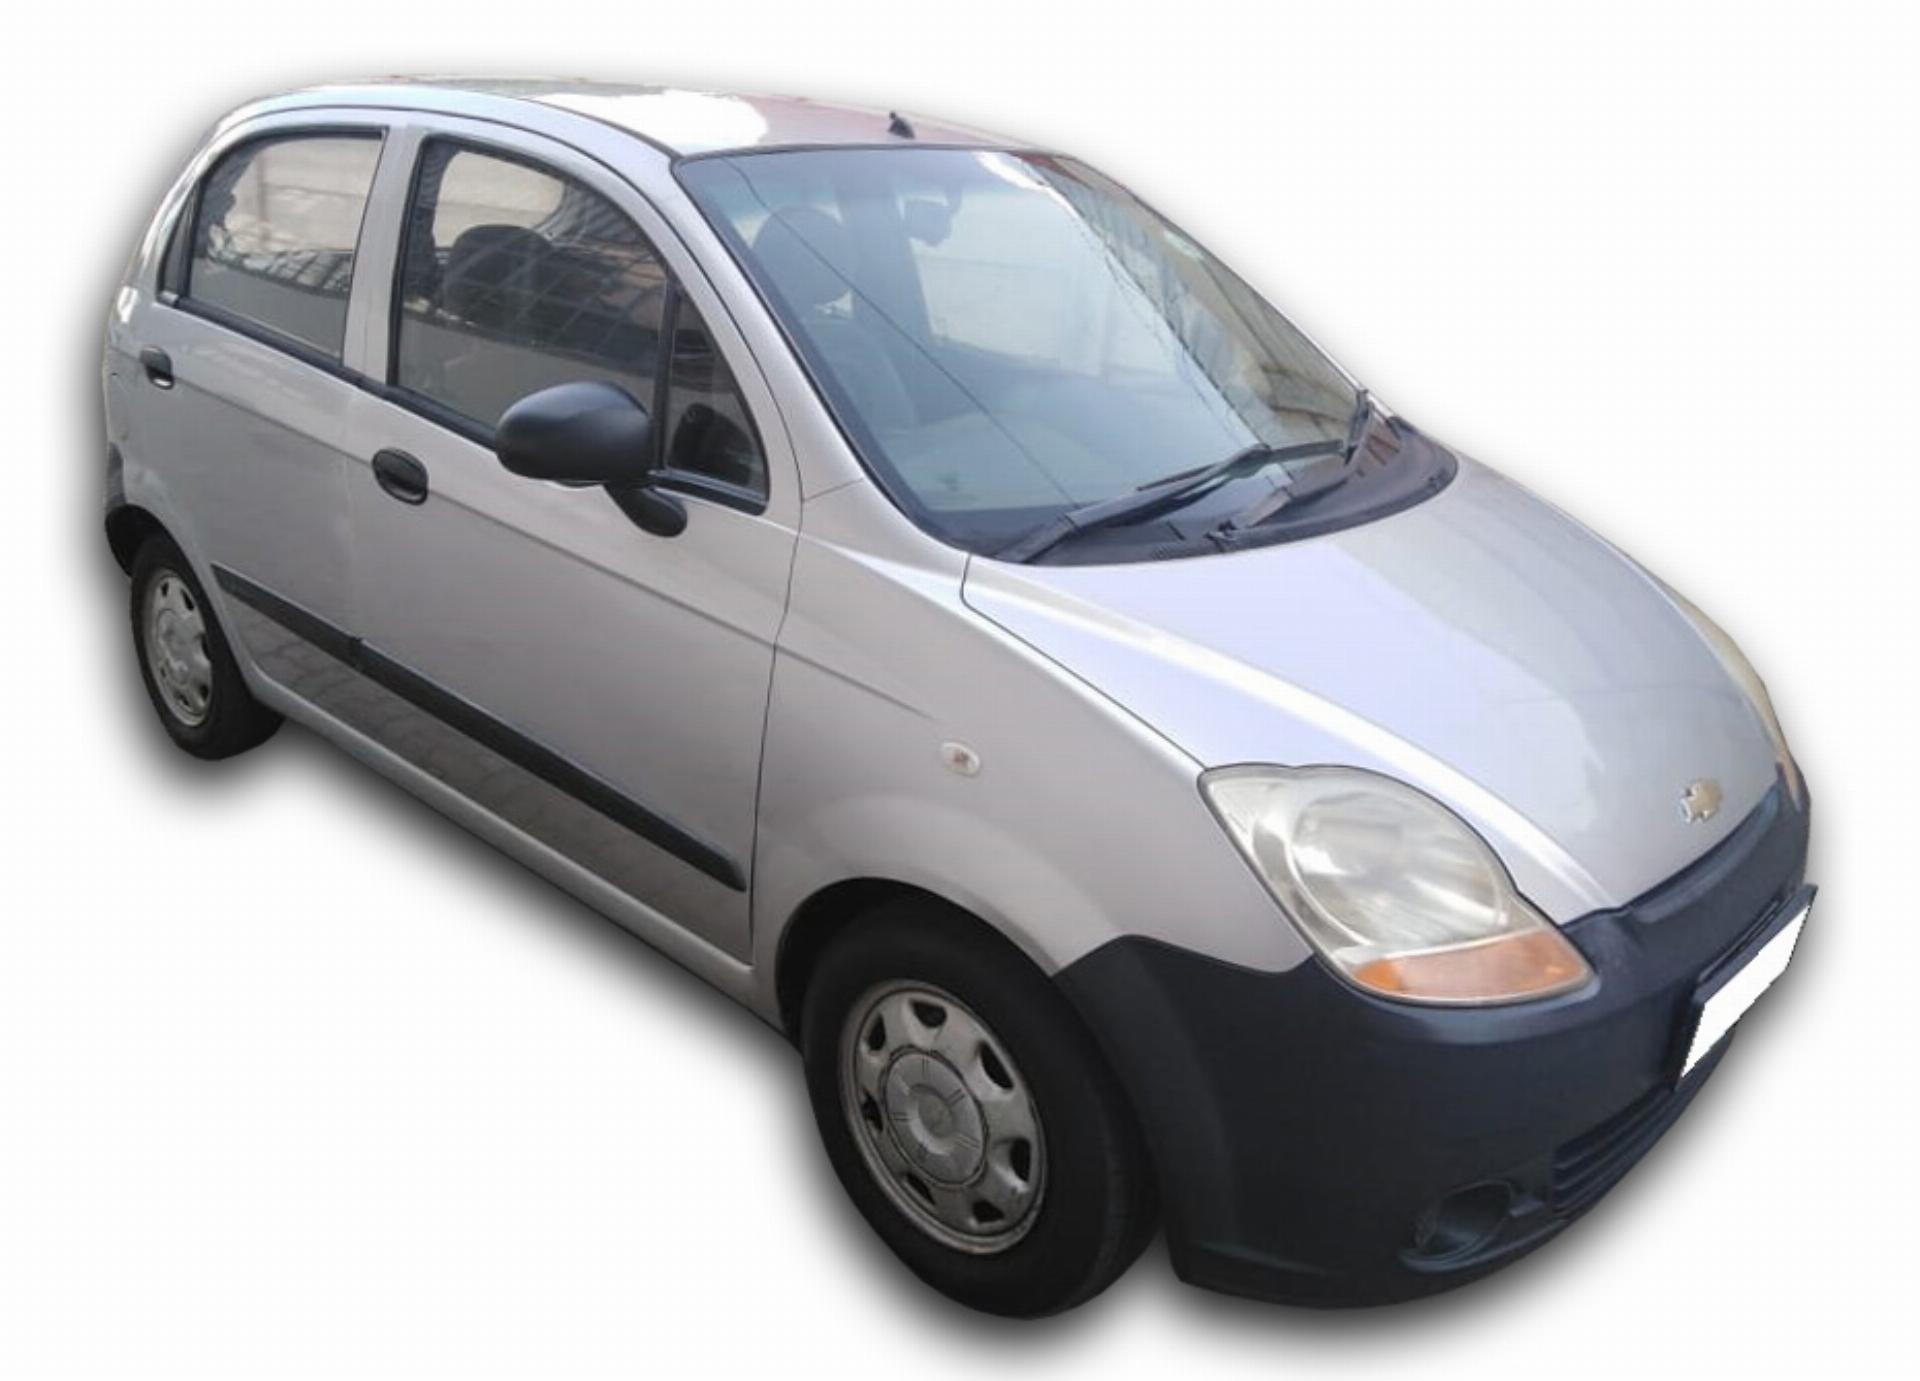 Chevrolet Spark 0.8 L